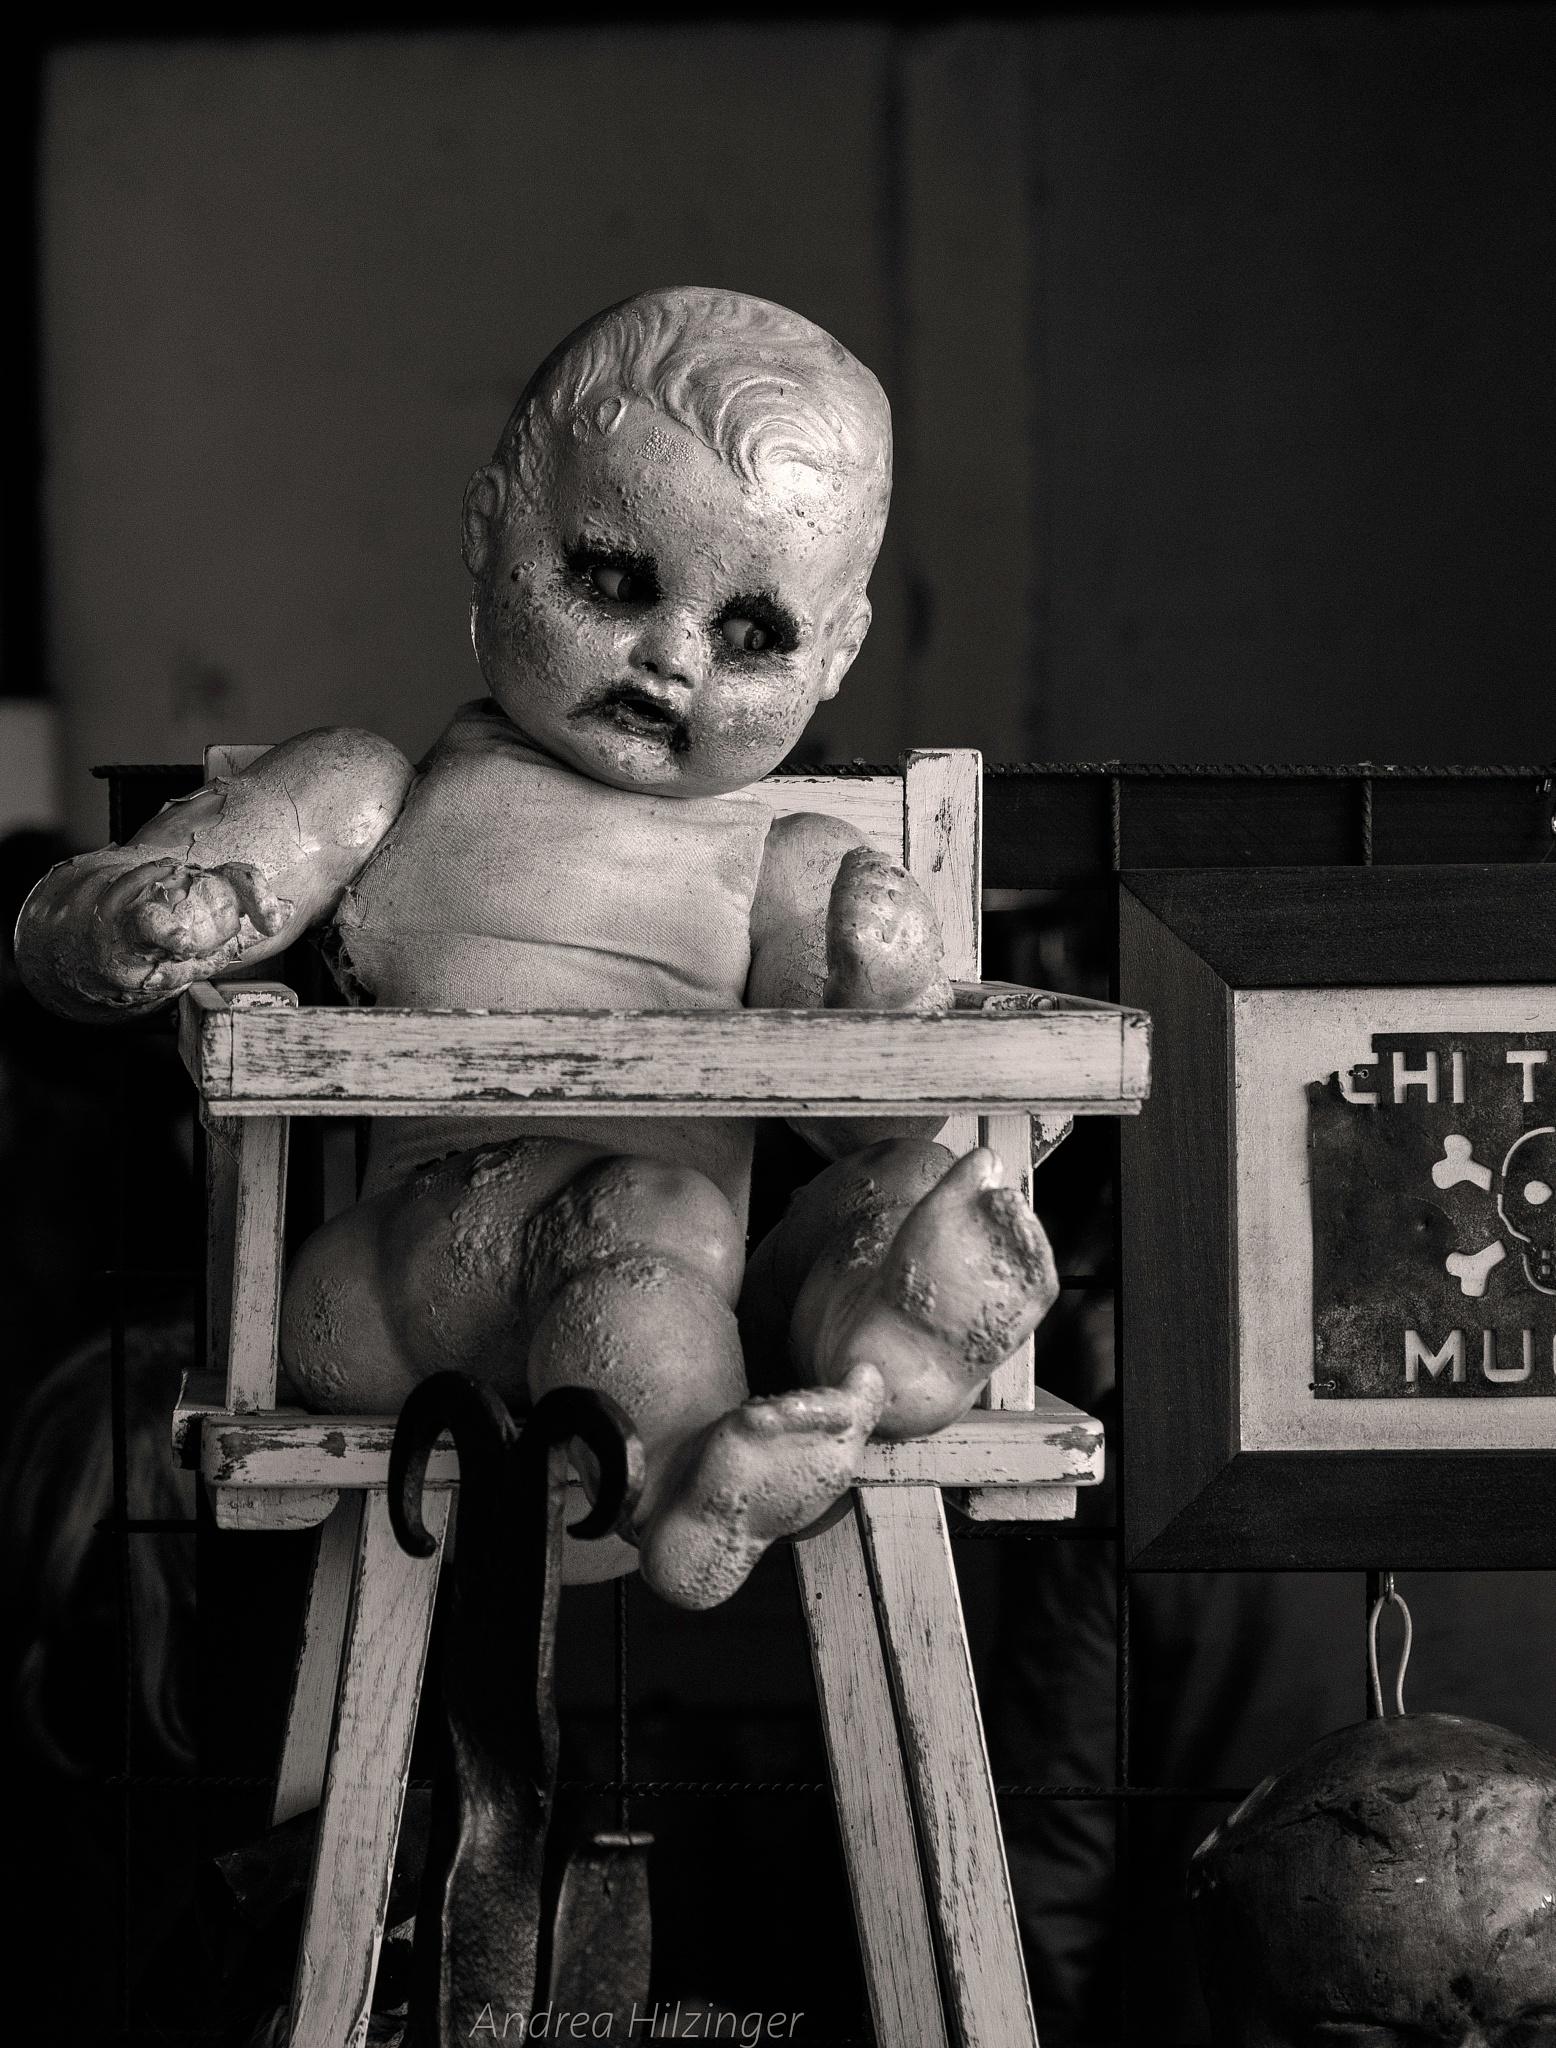 doll by Andrea Hilzinger